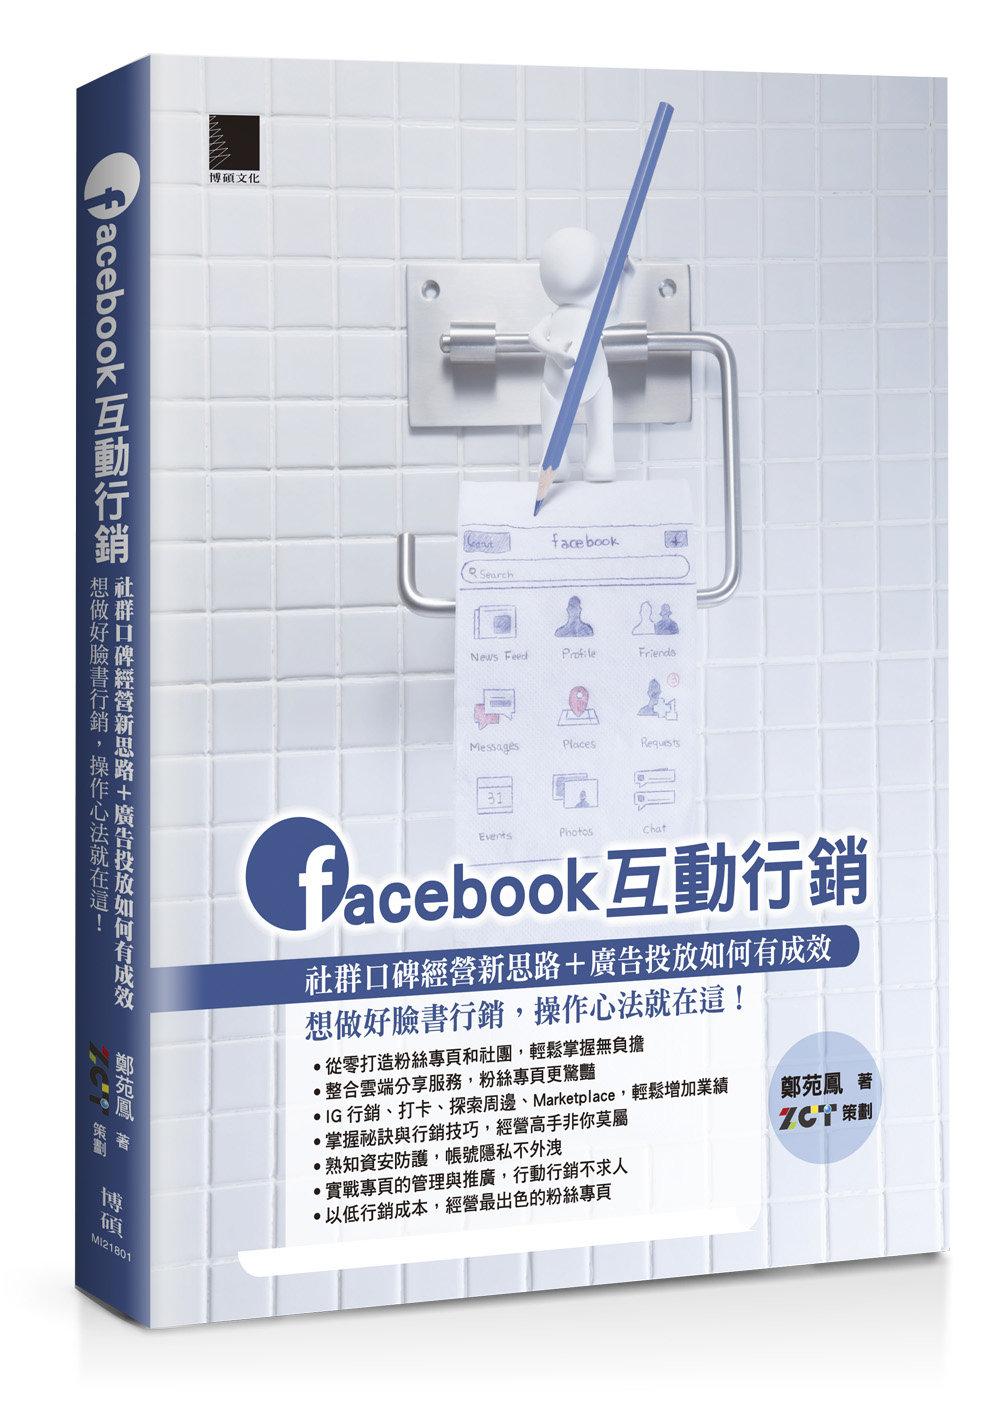 Facebook 互動行銷:社群口碑經營新思路+廣告投放如何有成效,想做好臉書行銷,操作心法就在這!-preview-1